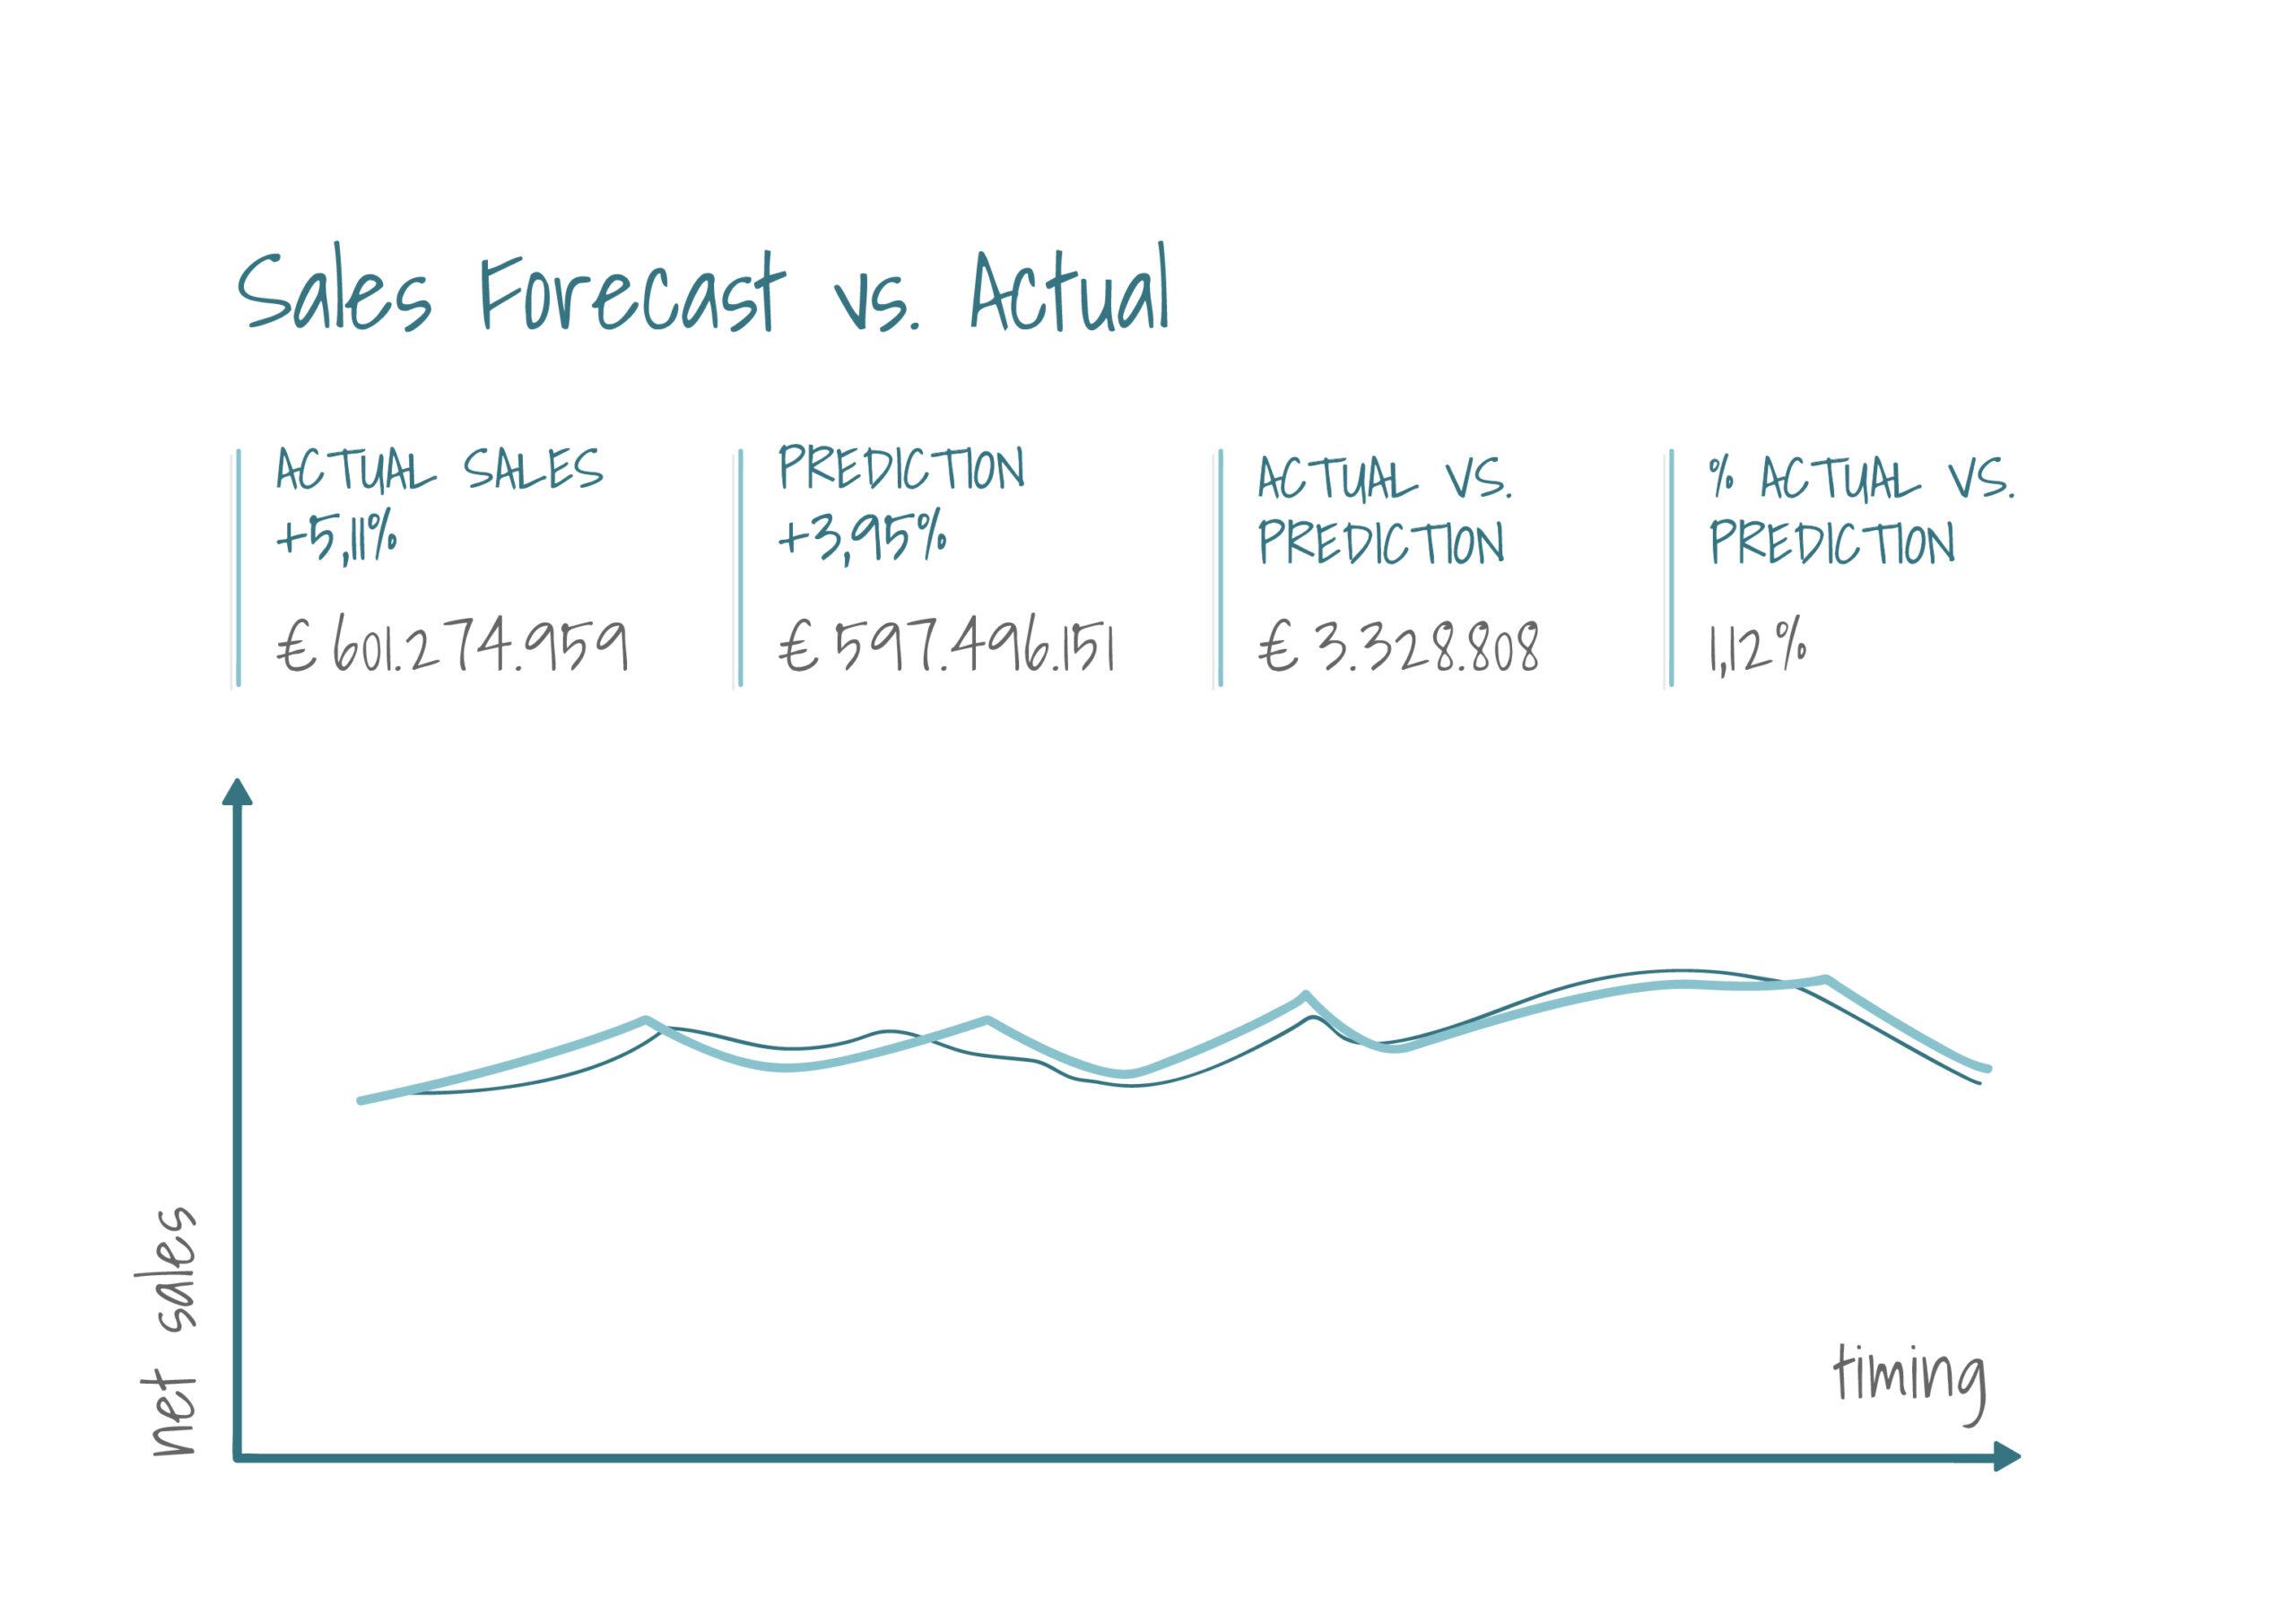 Sales Forecast vs. Actual